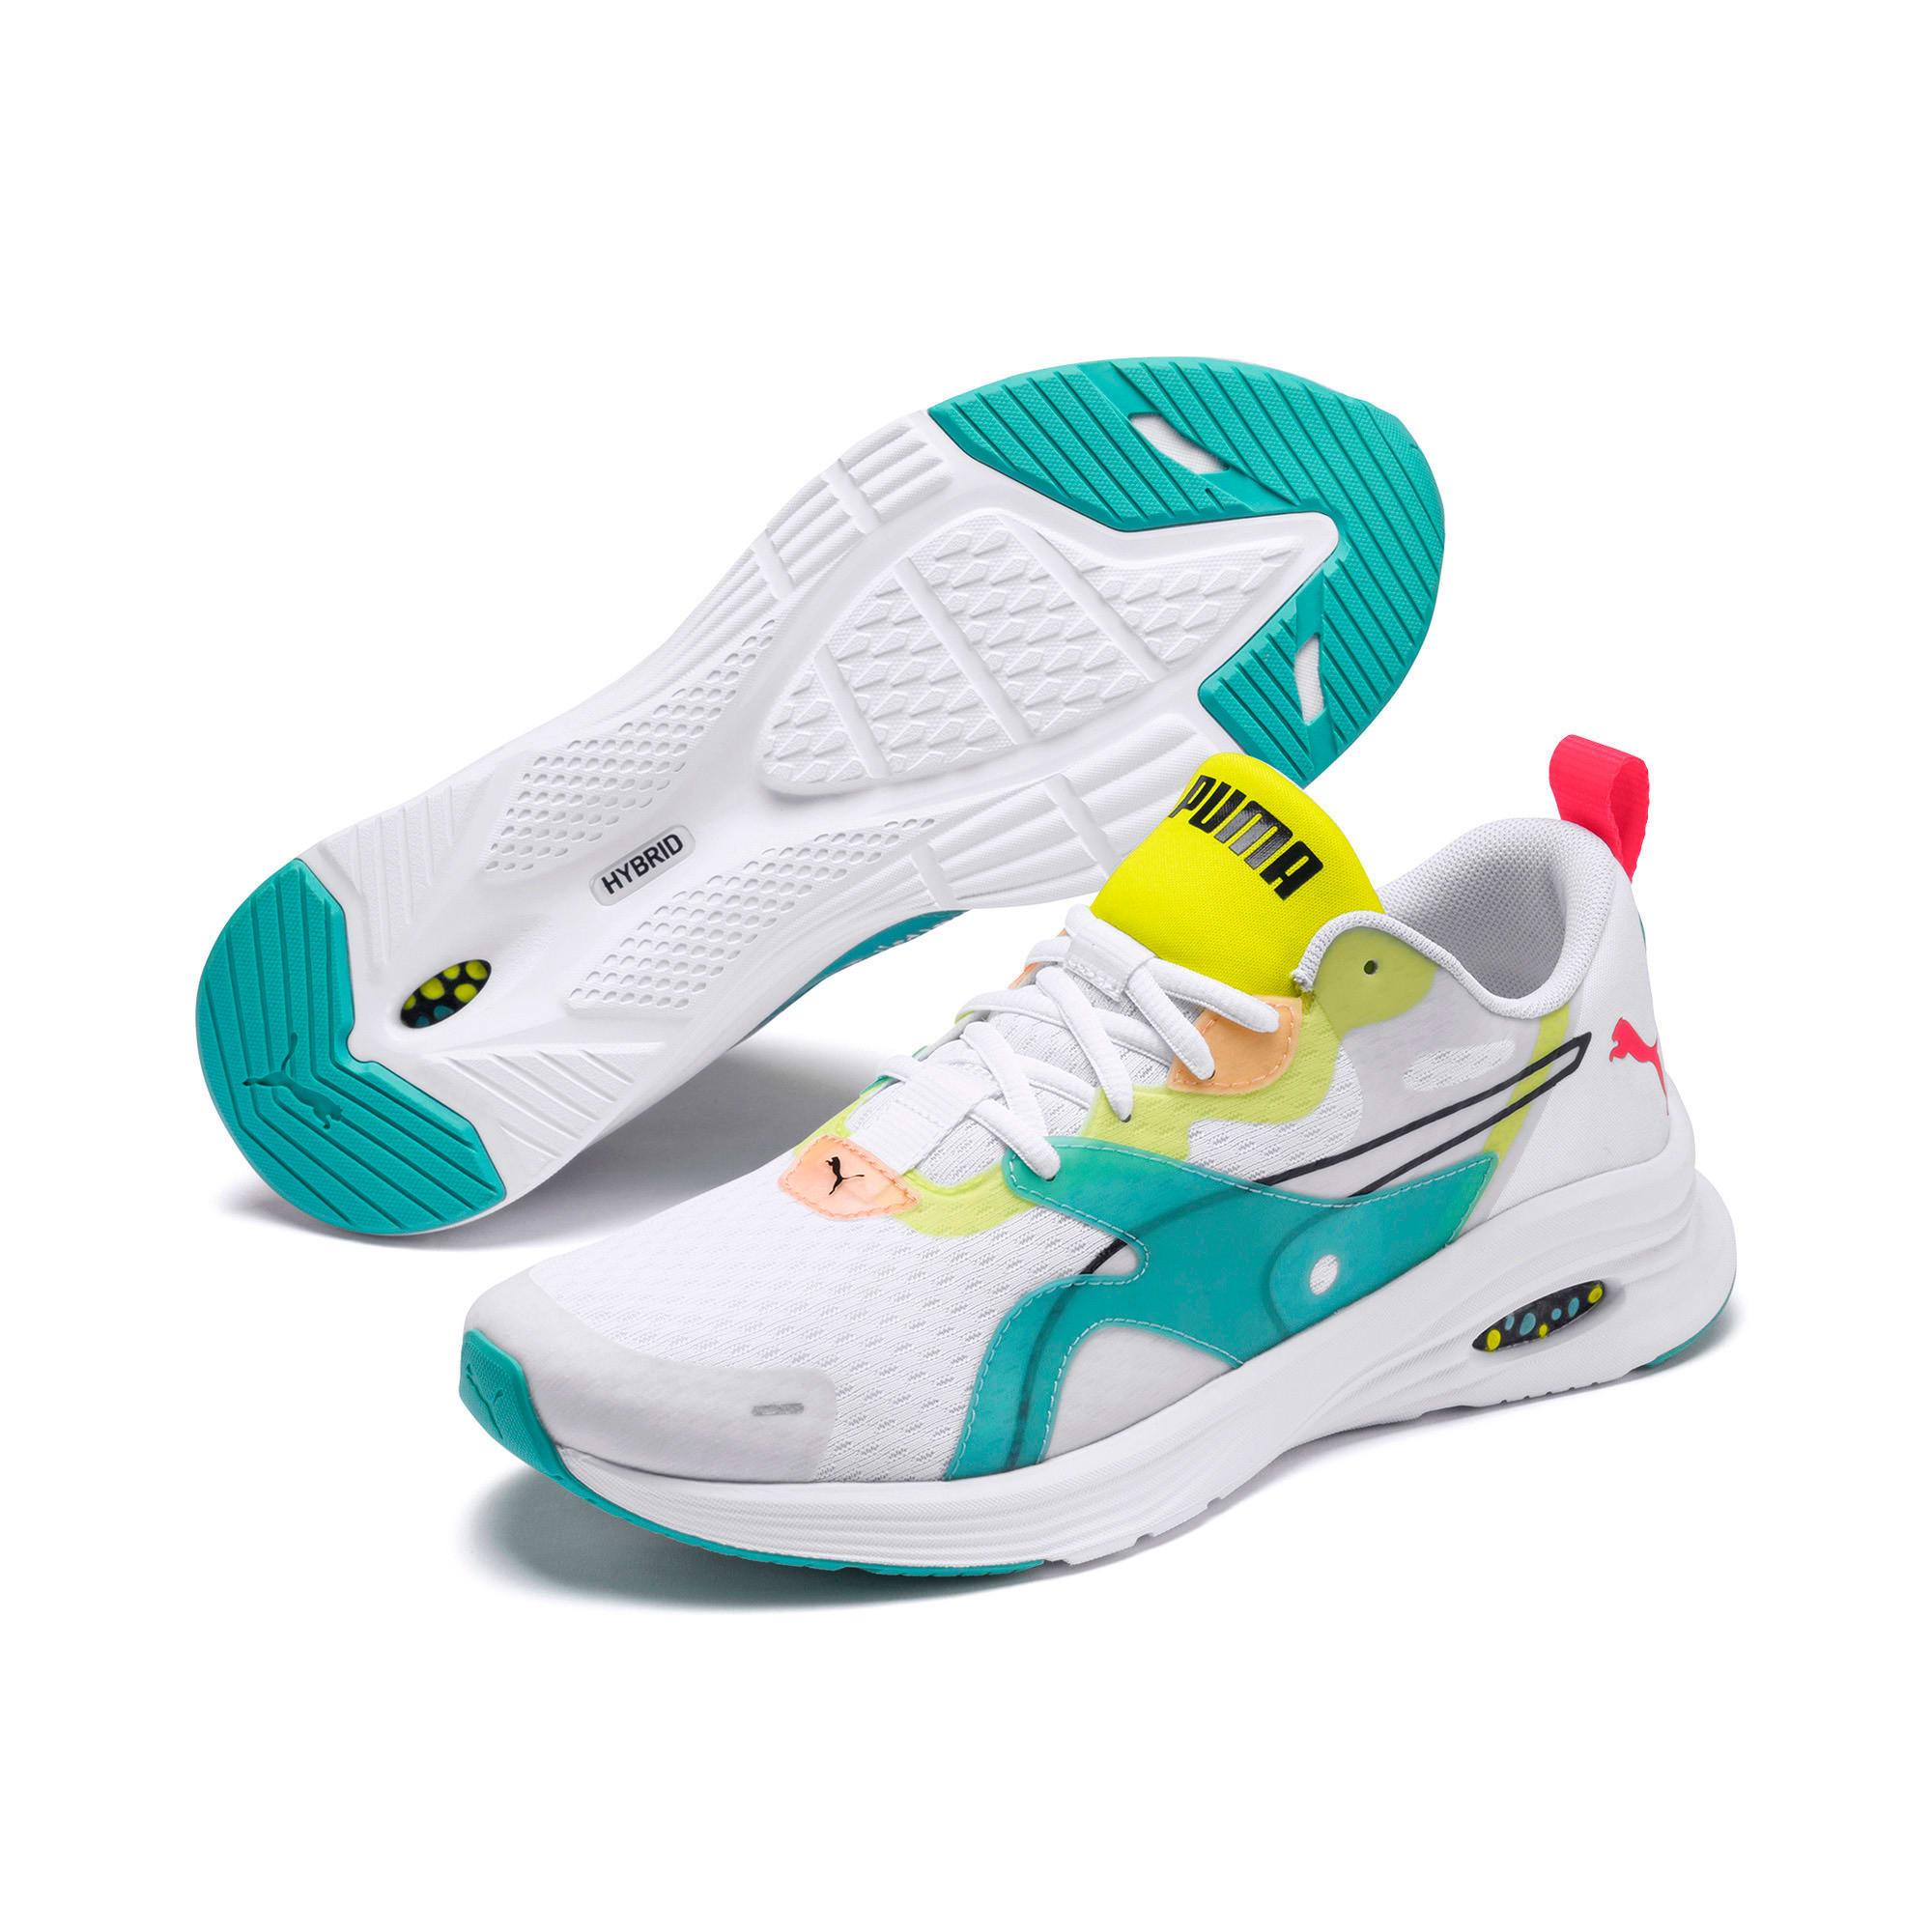 Thumbnail 2 of HYBRID Fuego Men's Running Shoes, White-Nrgy Rose-Yellow Alert, medium